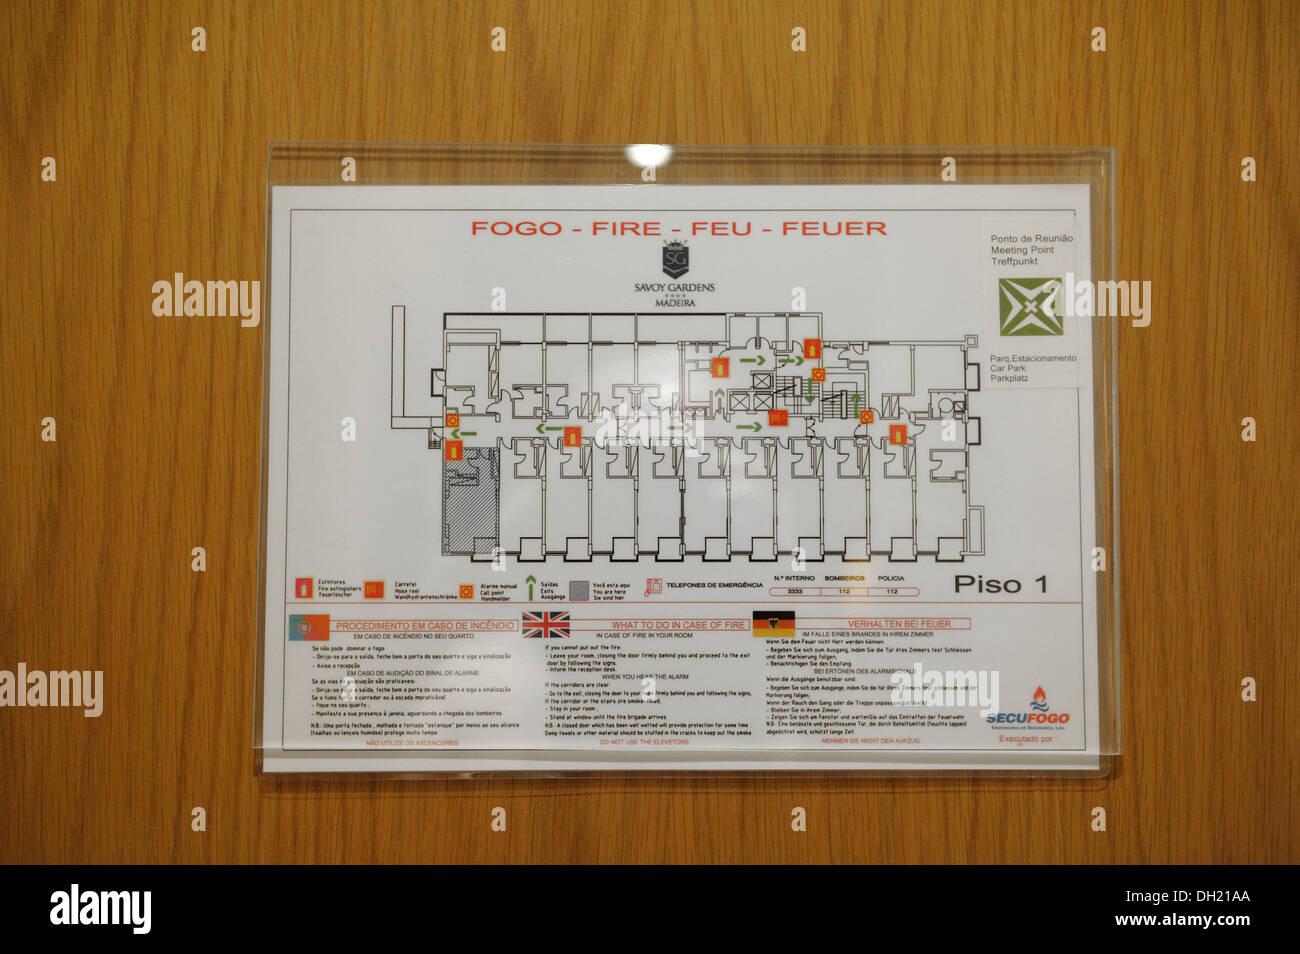 Hotel Fire Exit Diagrams - Shoutfm.co.uk •